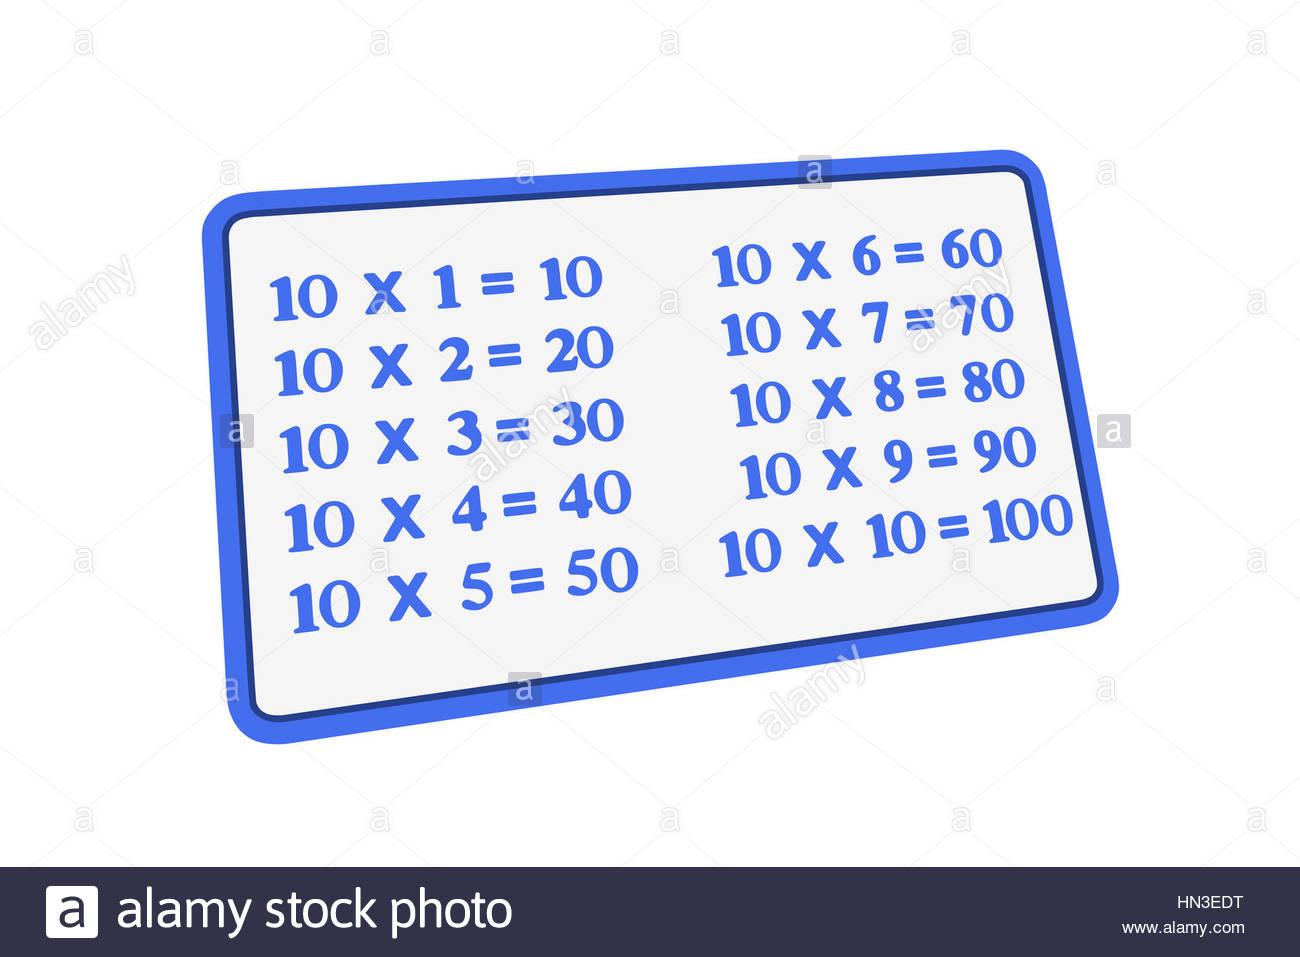 Multiplication Tables Stock Photos Multiplication Tables Stock